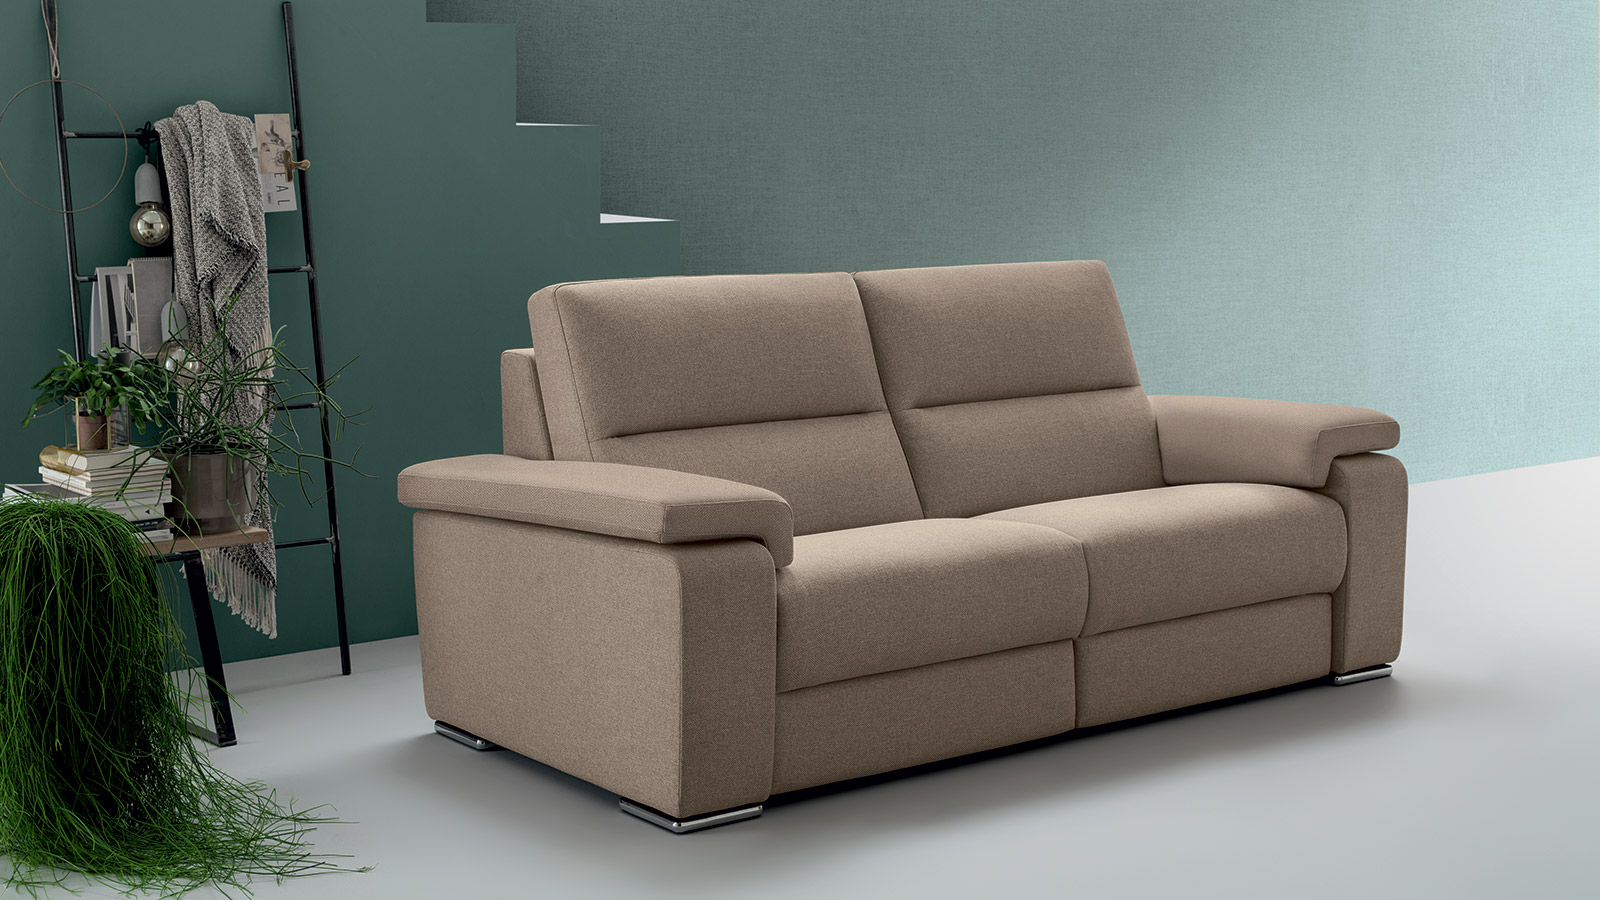 Eros divani moderni e di design felis